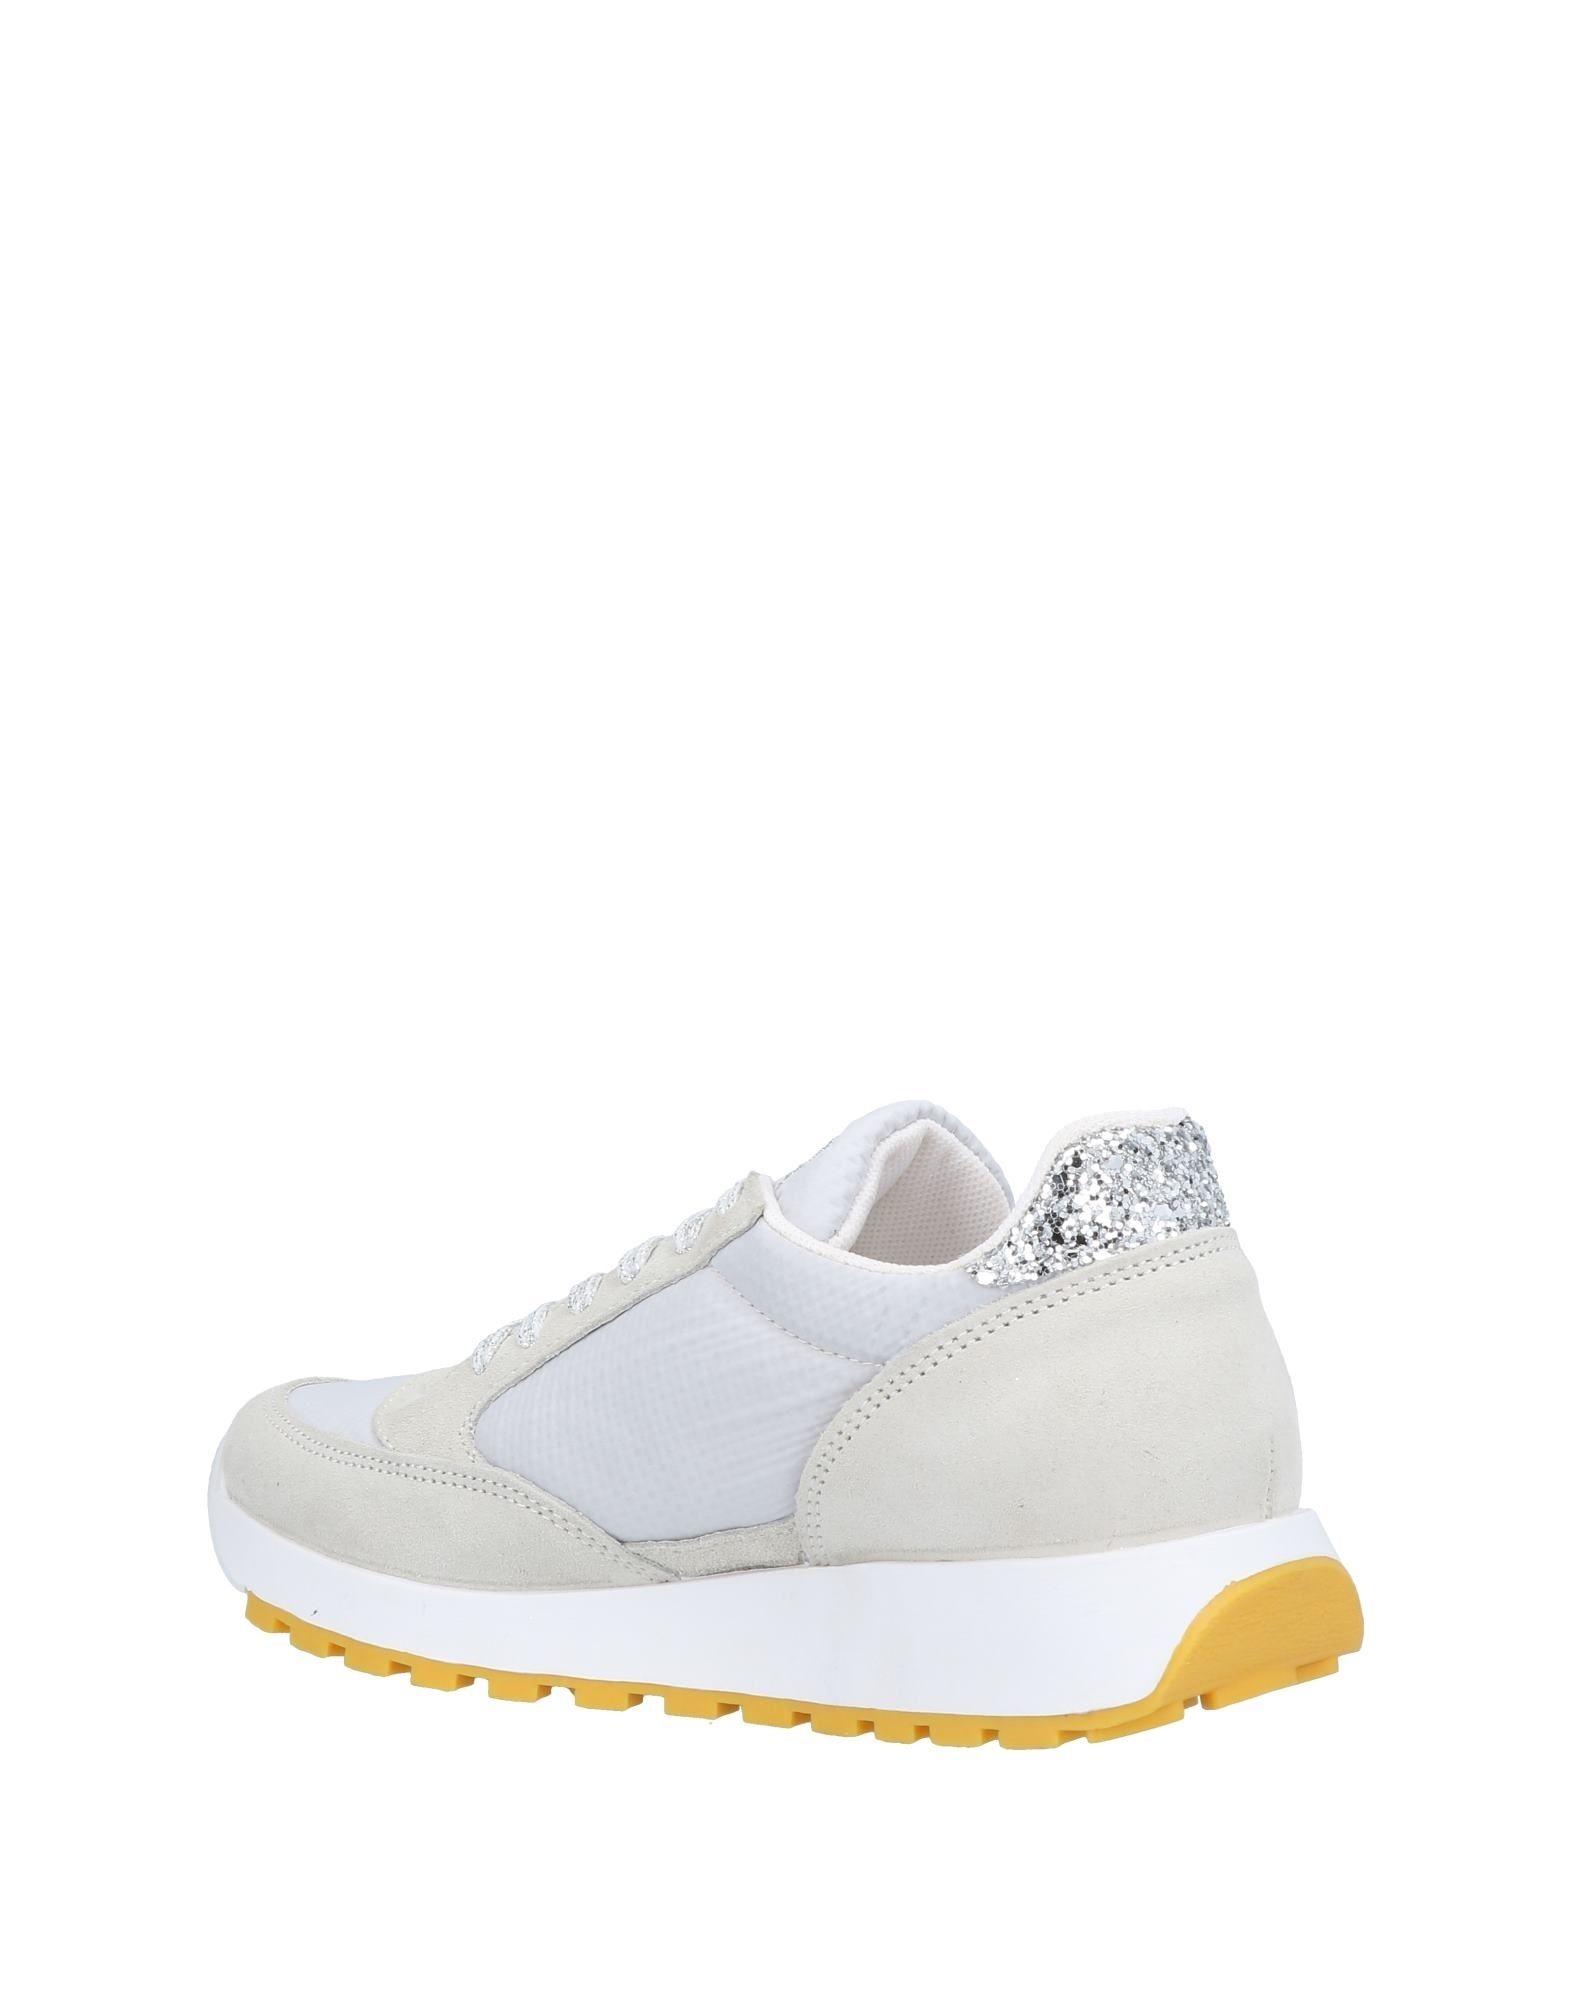 2Star  Sneakers Damen  11453501LL  2Star 3d3ac7